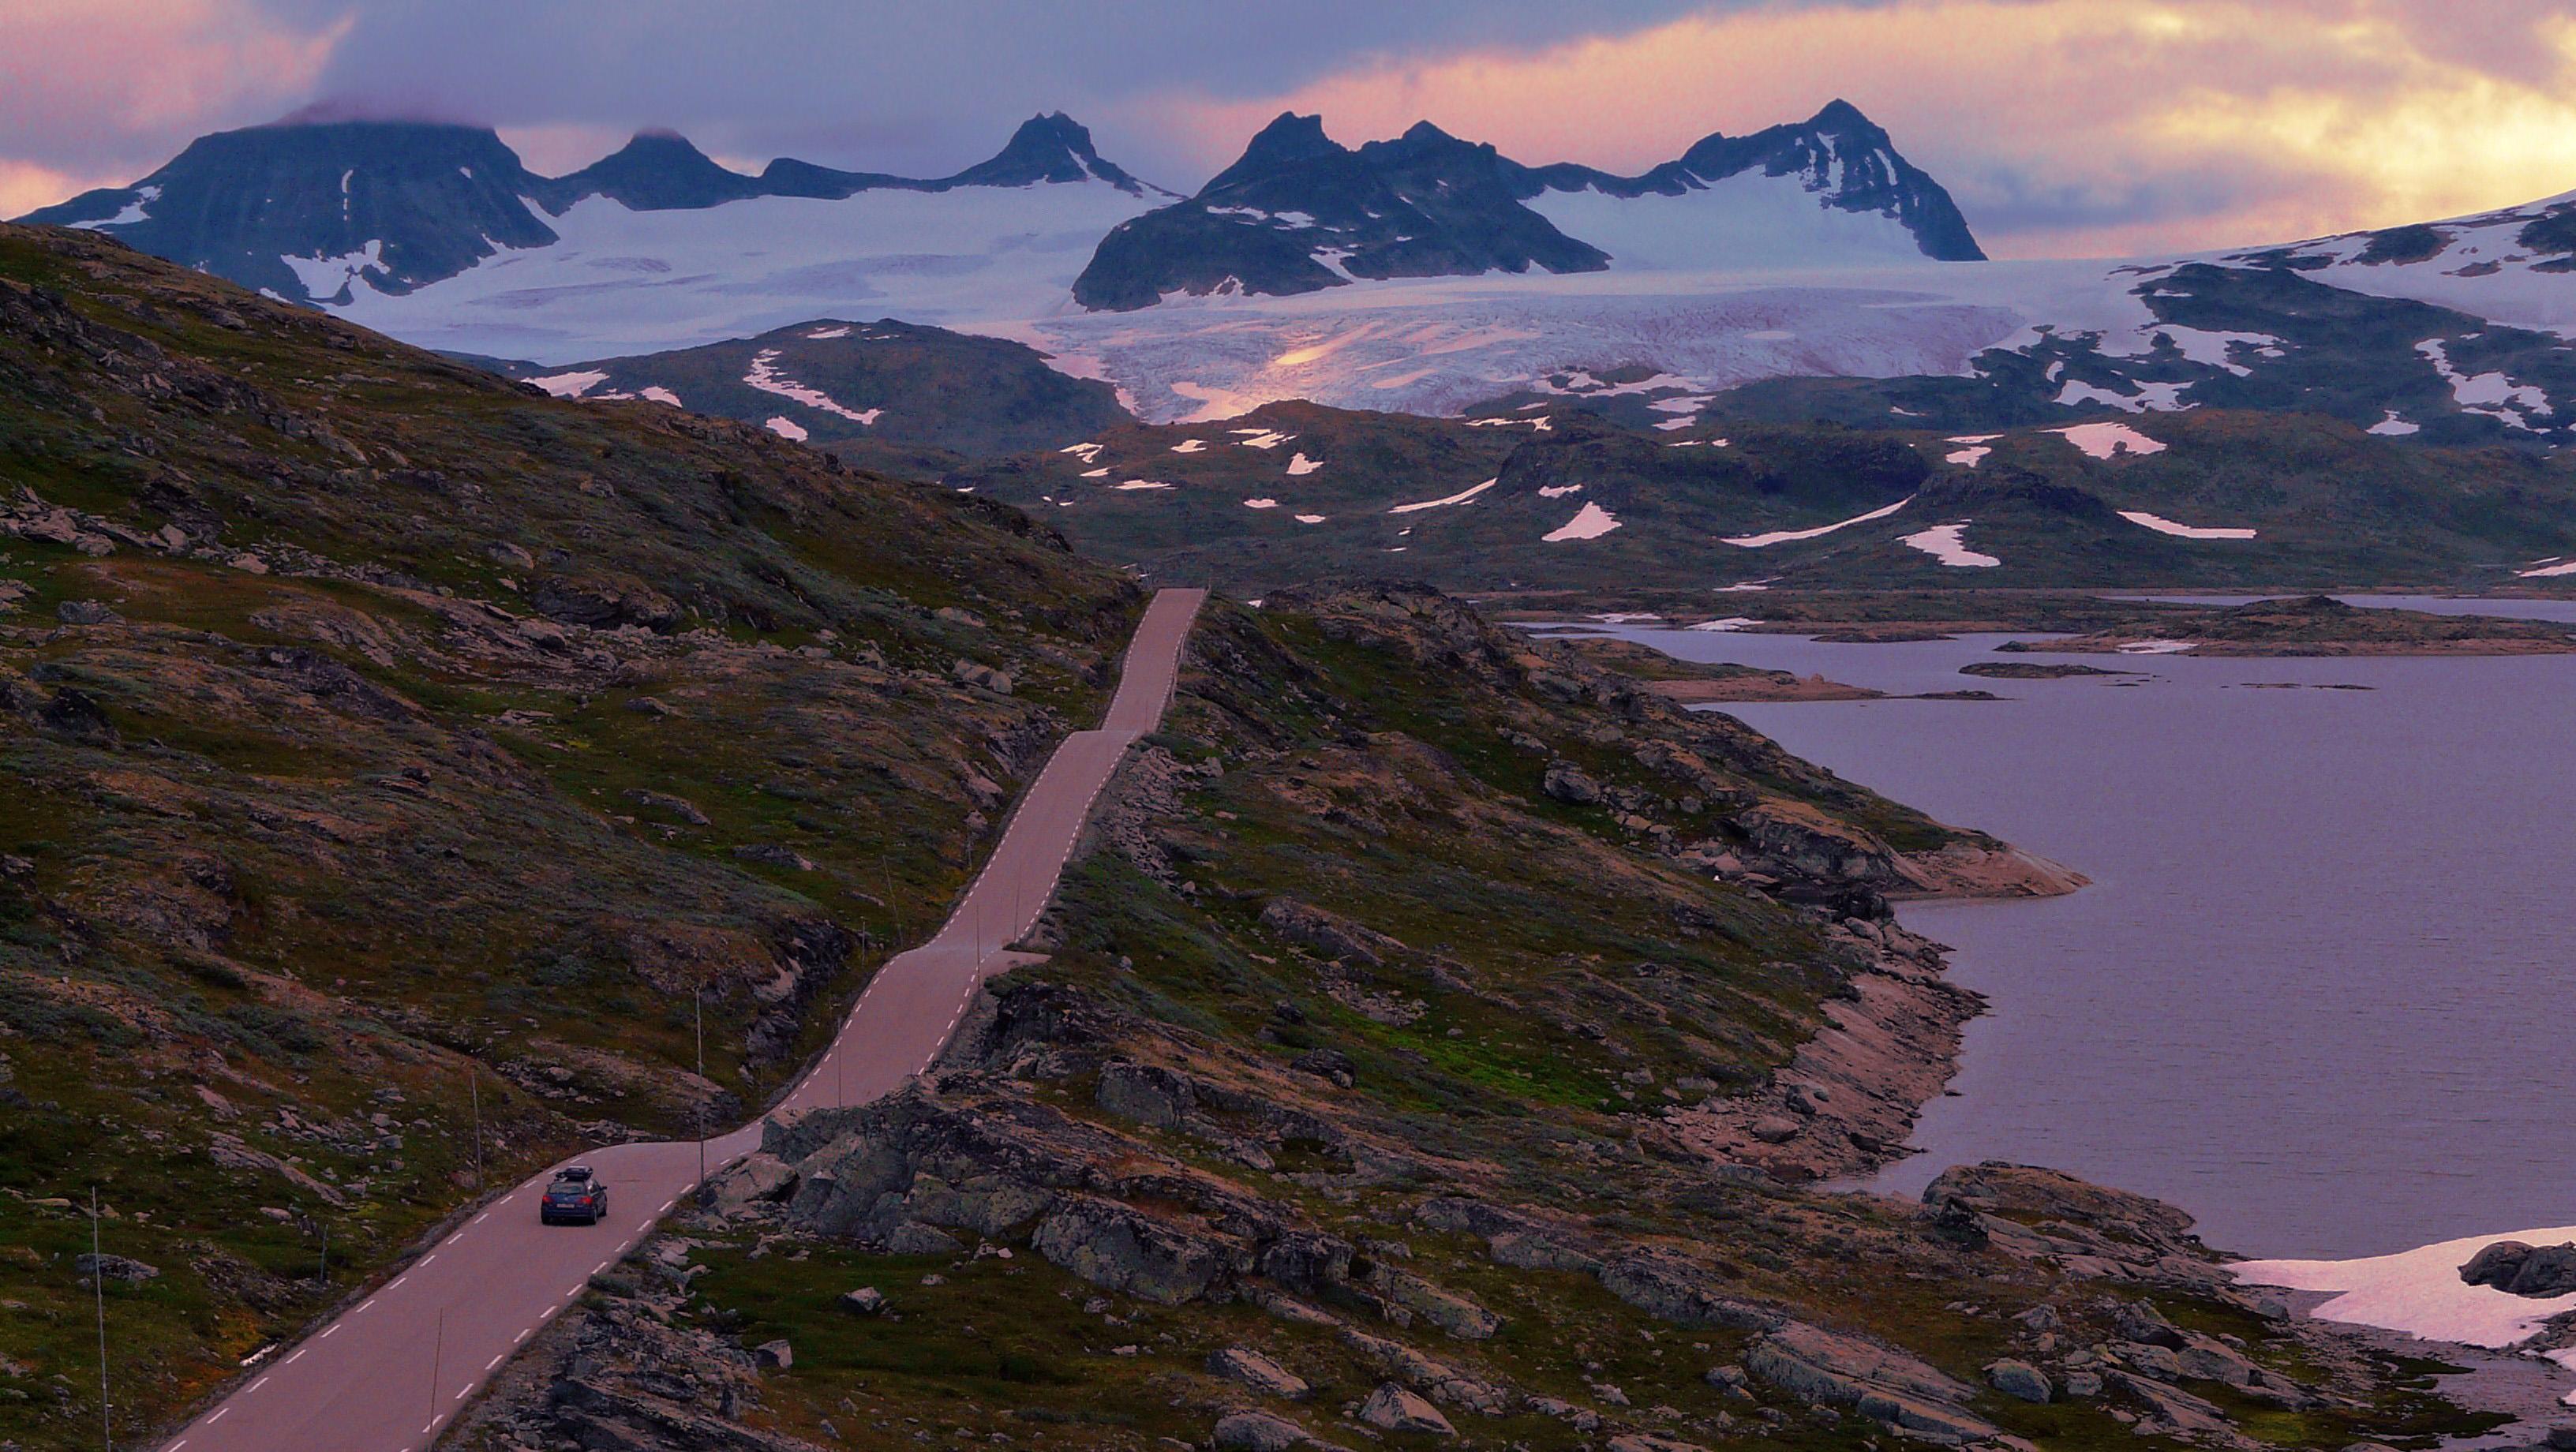 sognefjellsvegen - Norway - Wiki Image